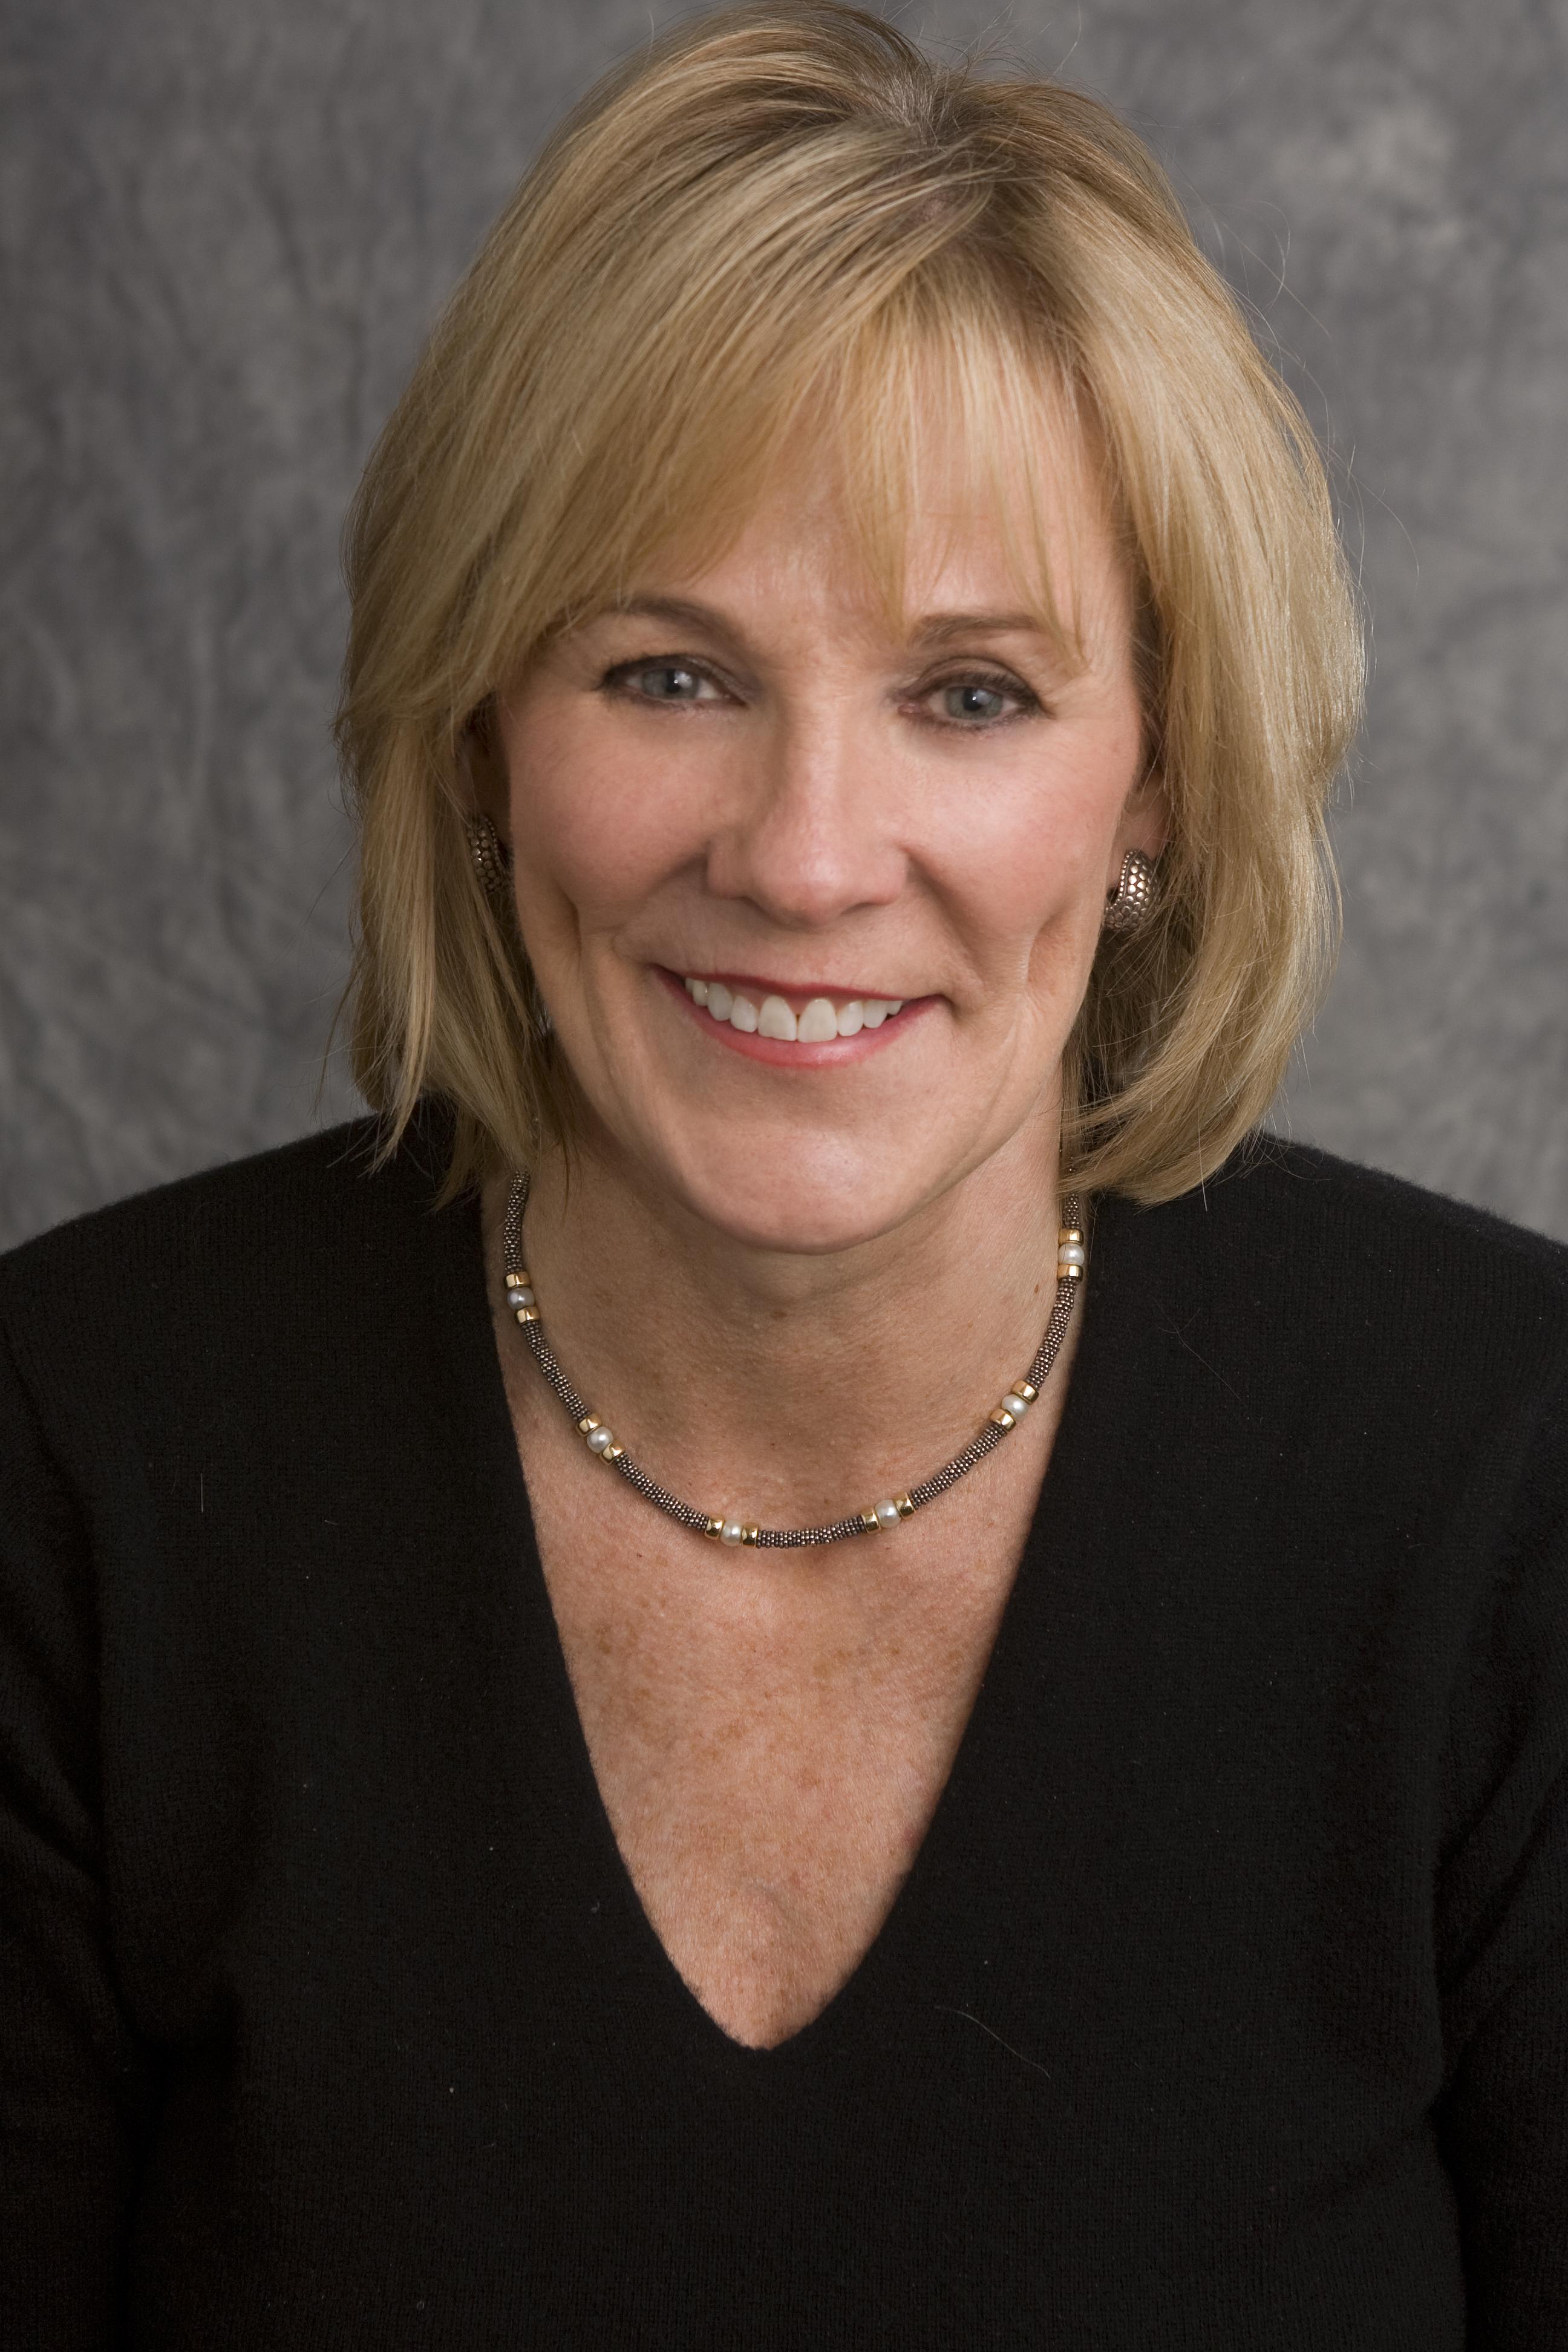 Colleen McGrath